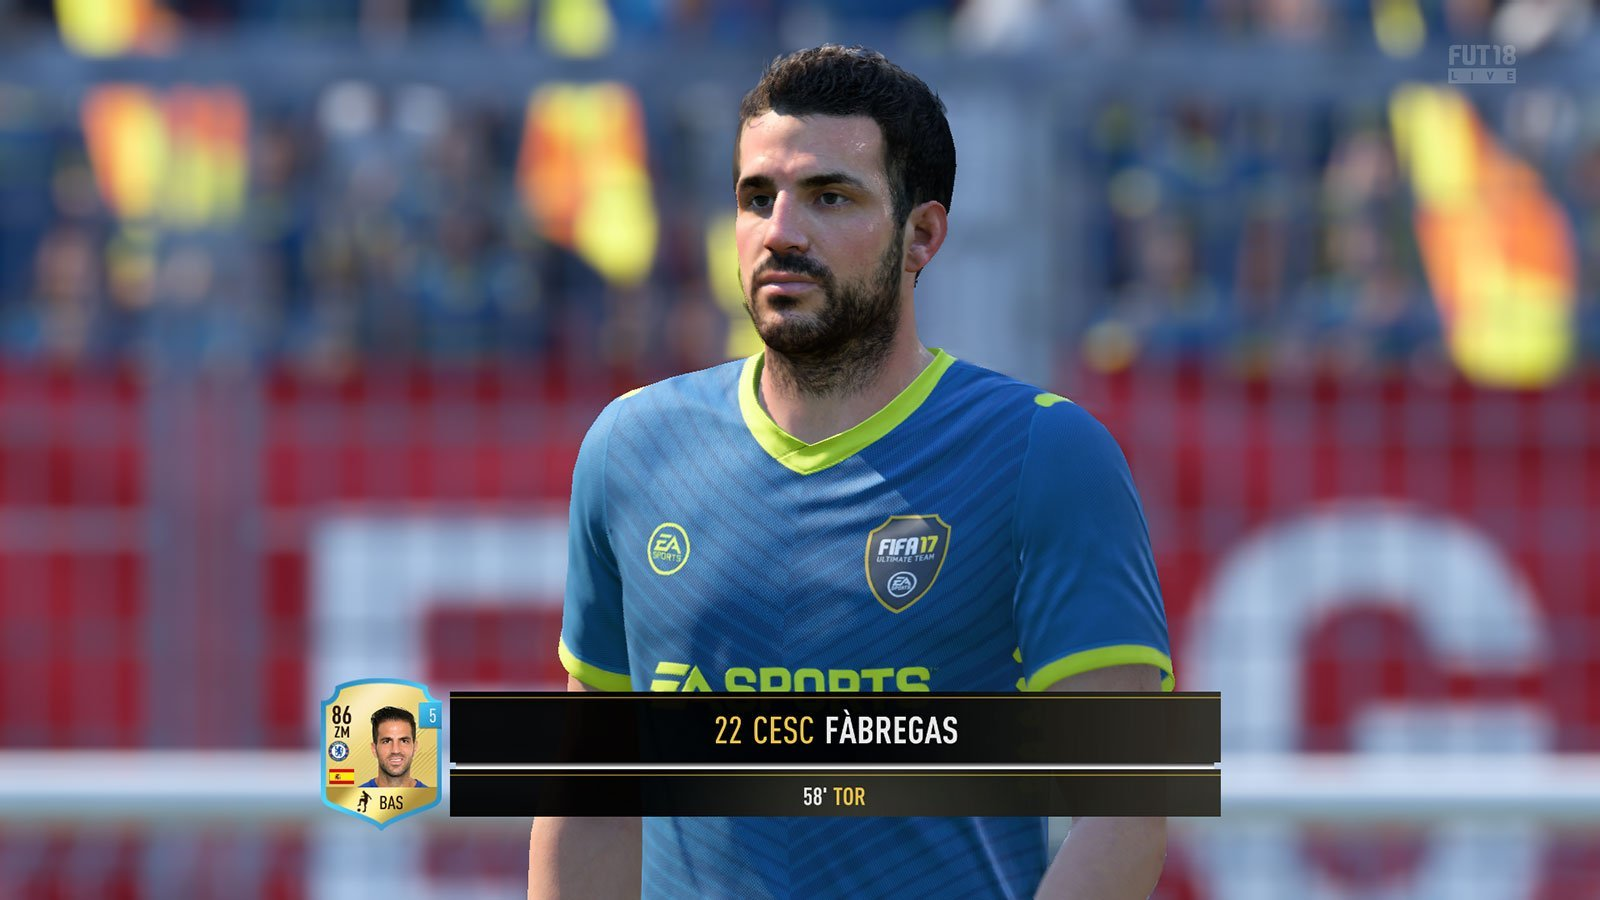 FIFA 18 Screenshot 2017.10.01 00.41.45